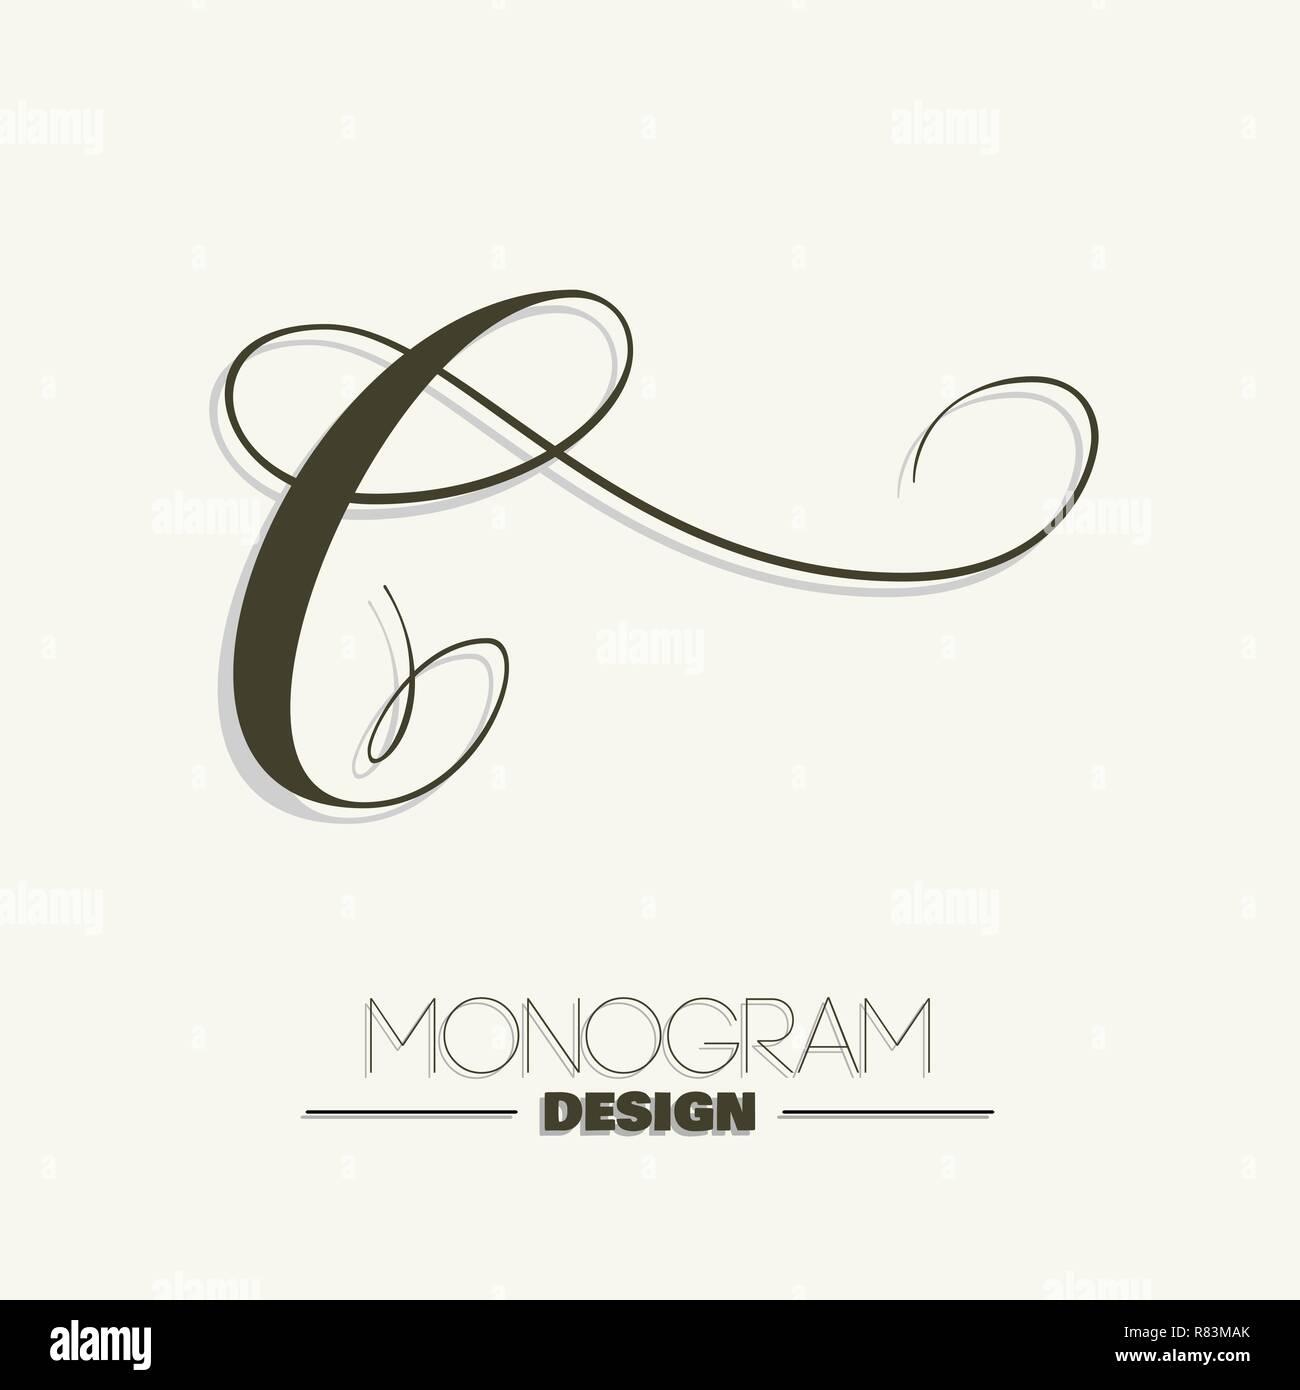 Capital C Hand Lettering Monogram Design Stock Vector Art